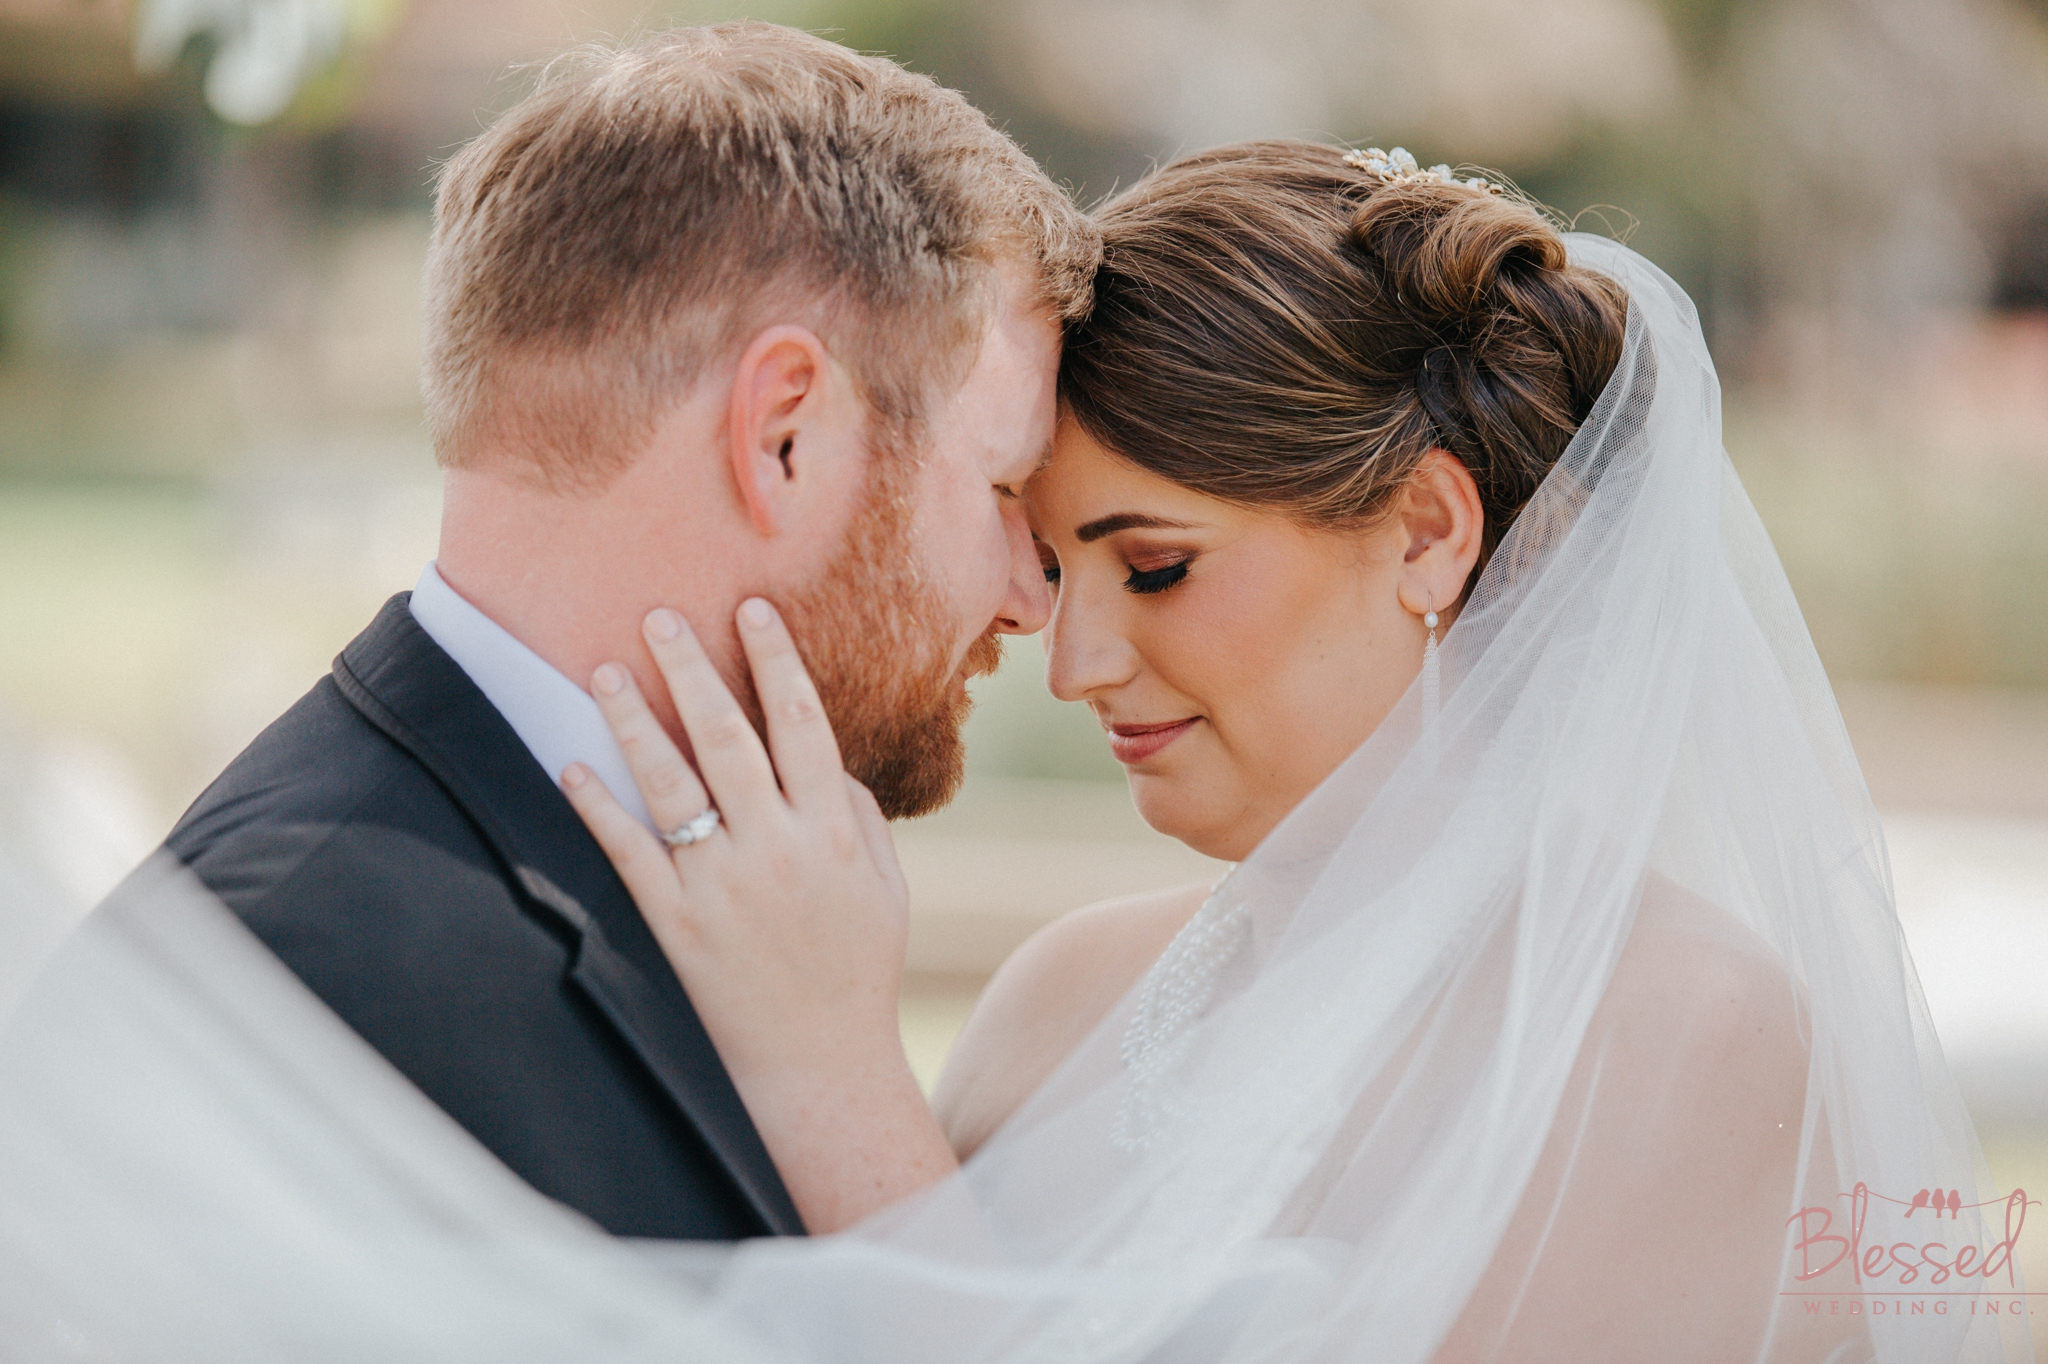 Orfila Vinery Wedding by Blessed Wedding Photography 30.jpg